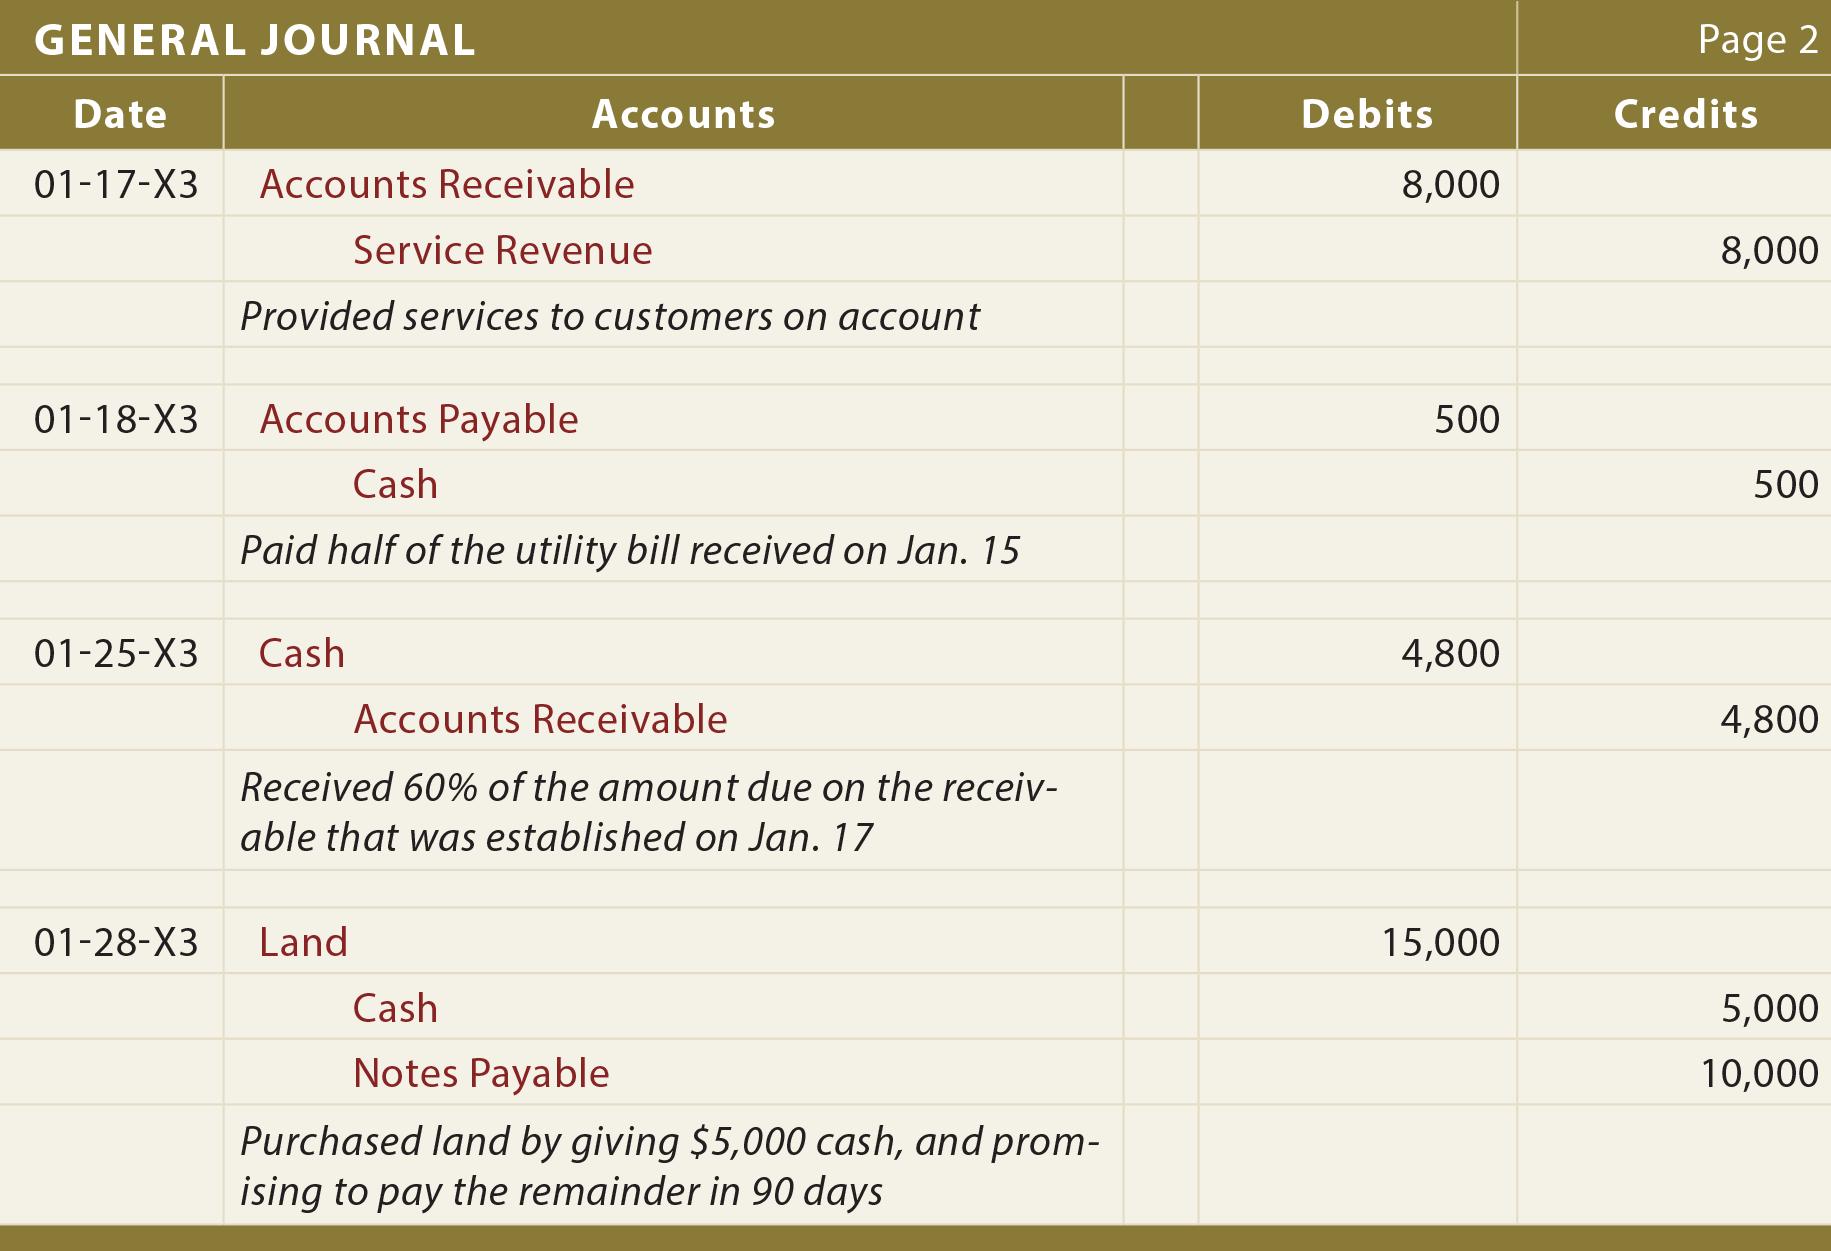 The Journal - principlesofaccounting.com